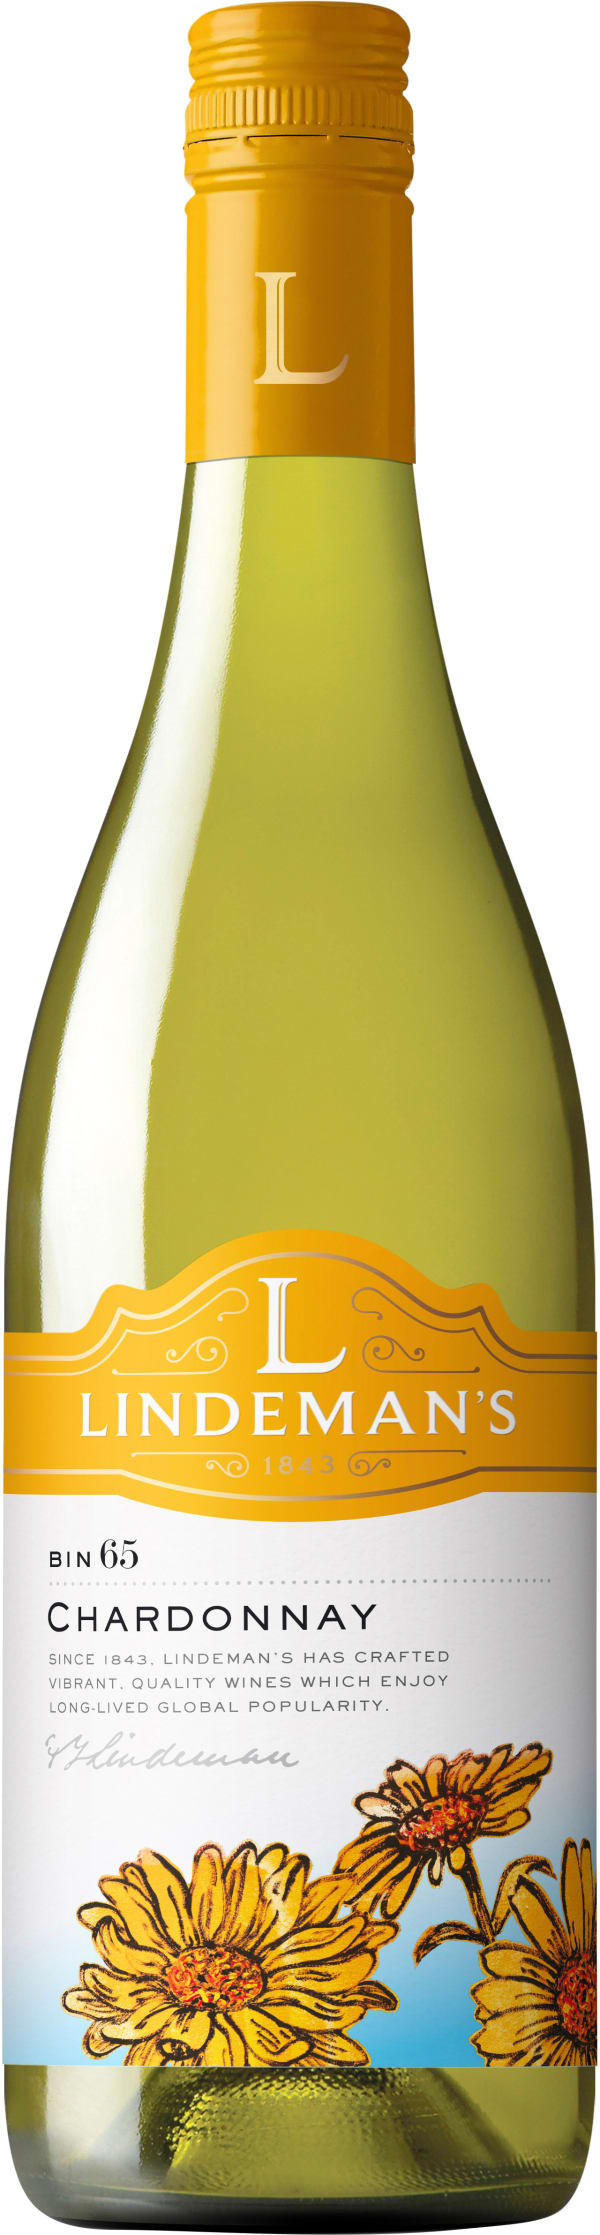 Lindemans Bin 65 Chardonnay 2020